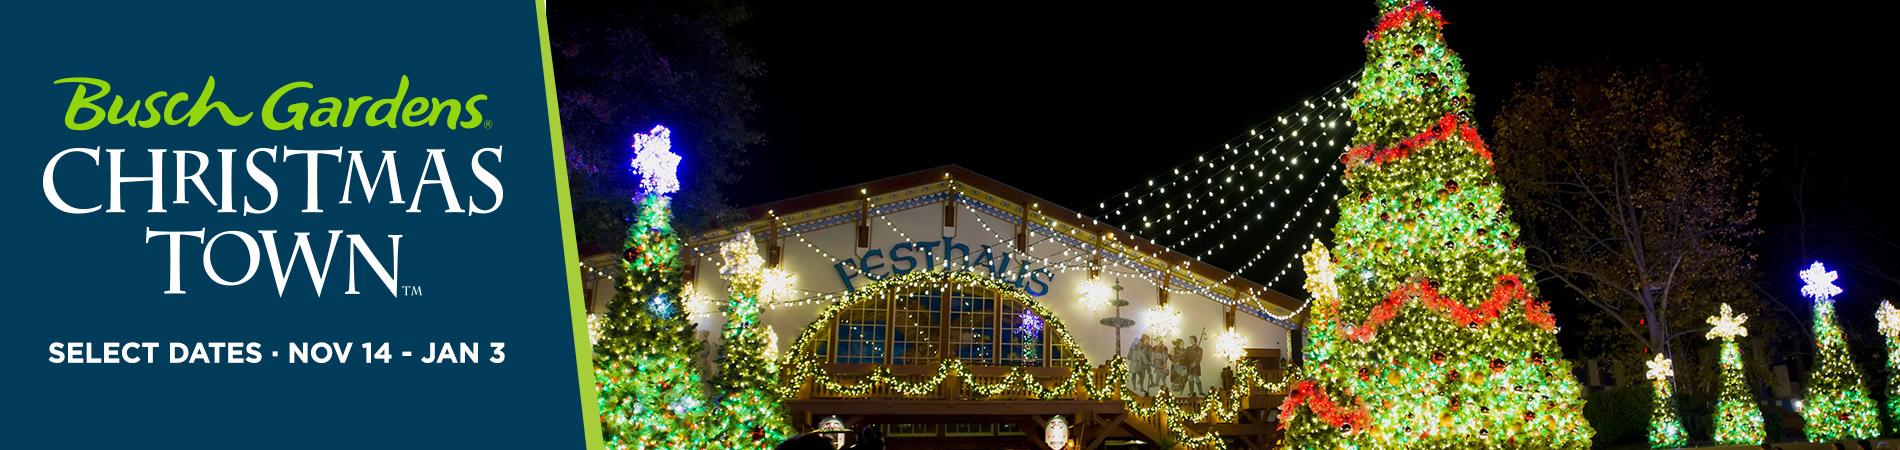 Busch Gardens Williamsburg Christmas Town Holiday Shows!